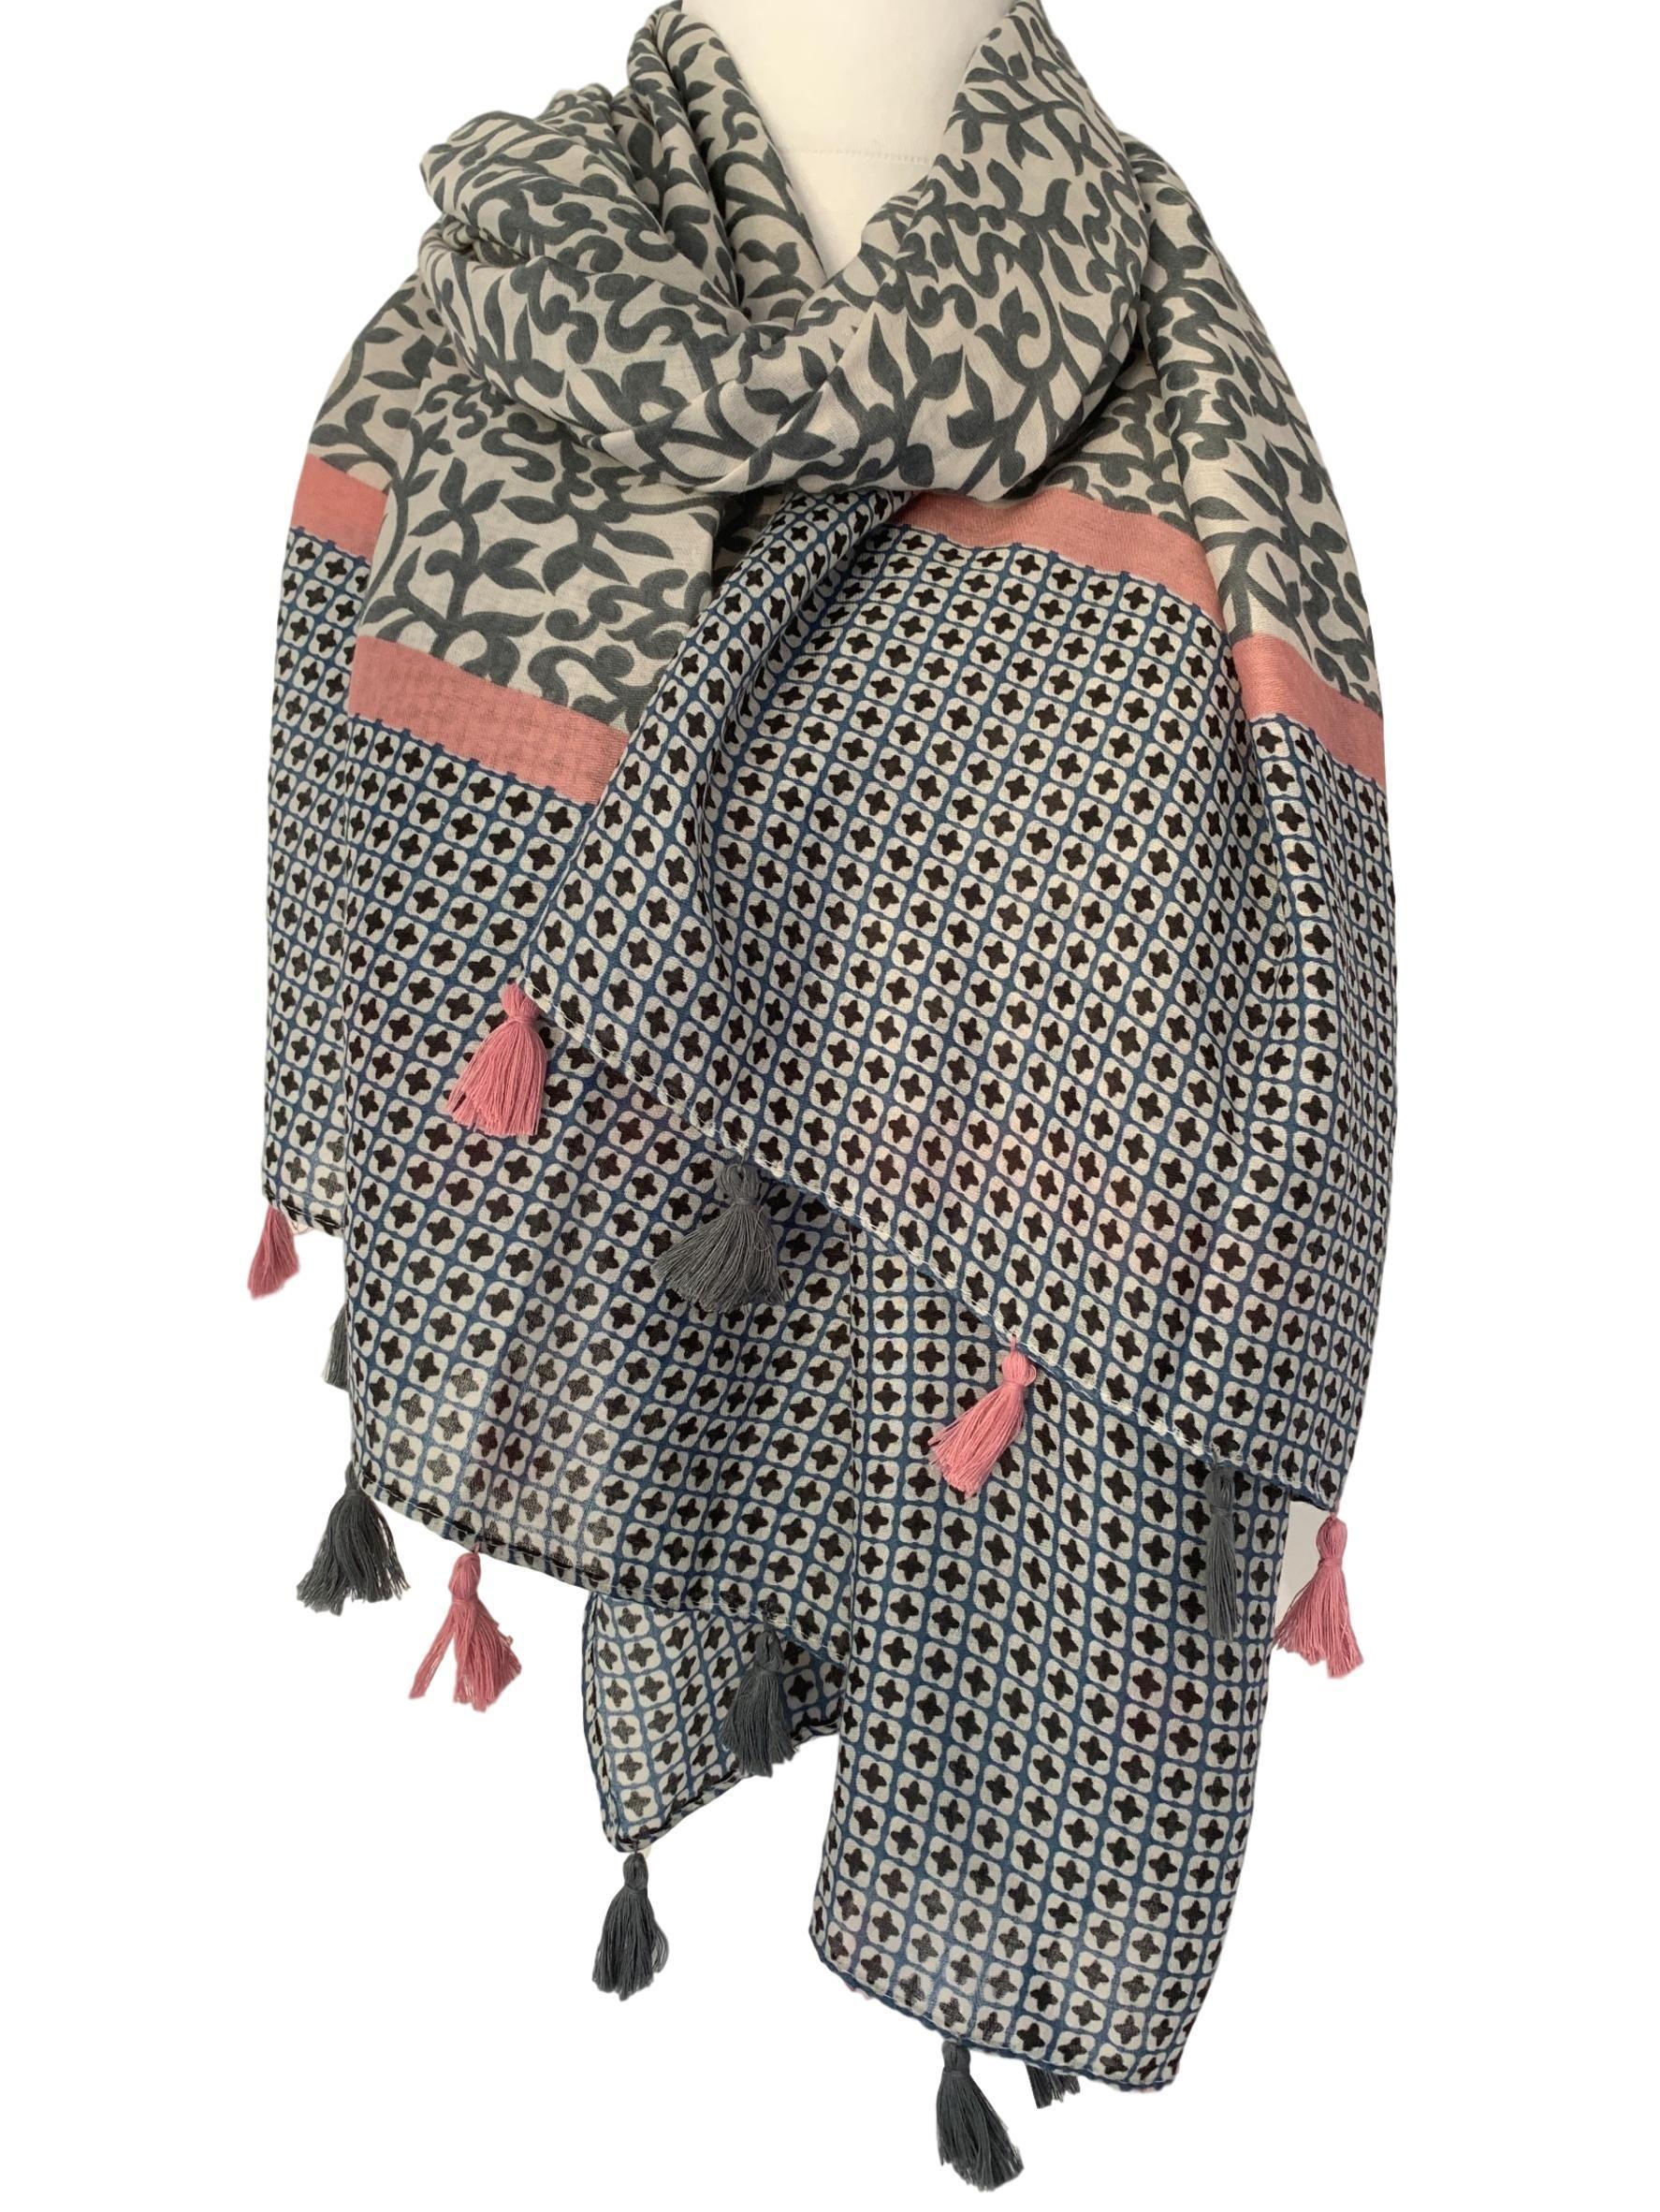 Black  Polka Dot Lady Women  Soft Scarf Shawl Wrap Headscarf Stole